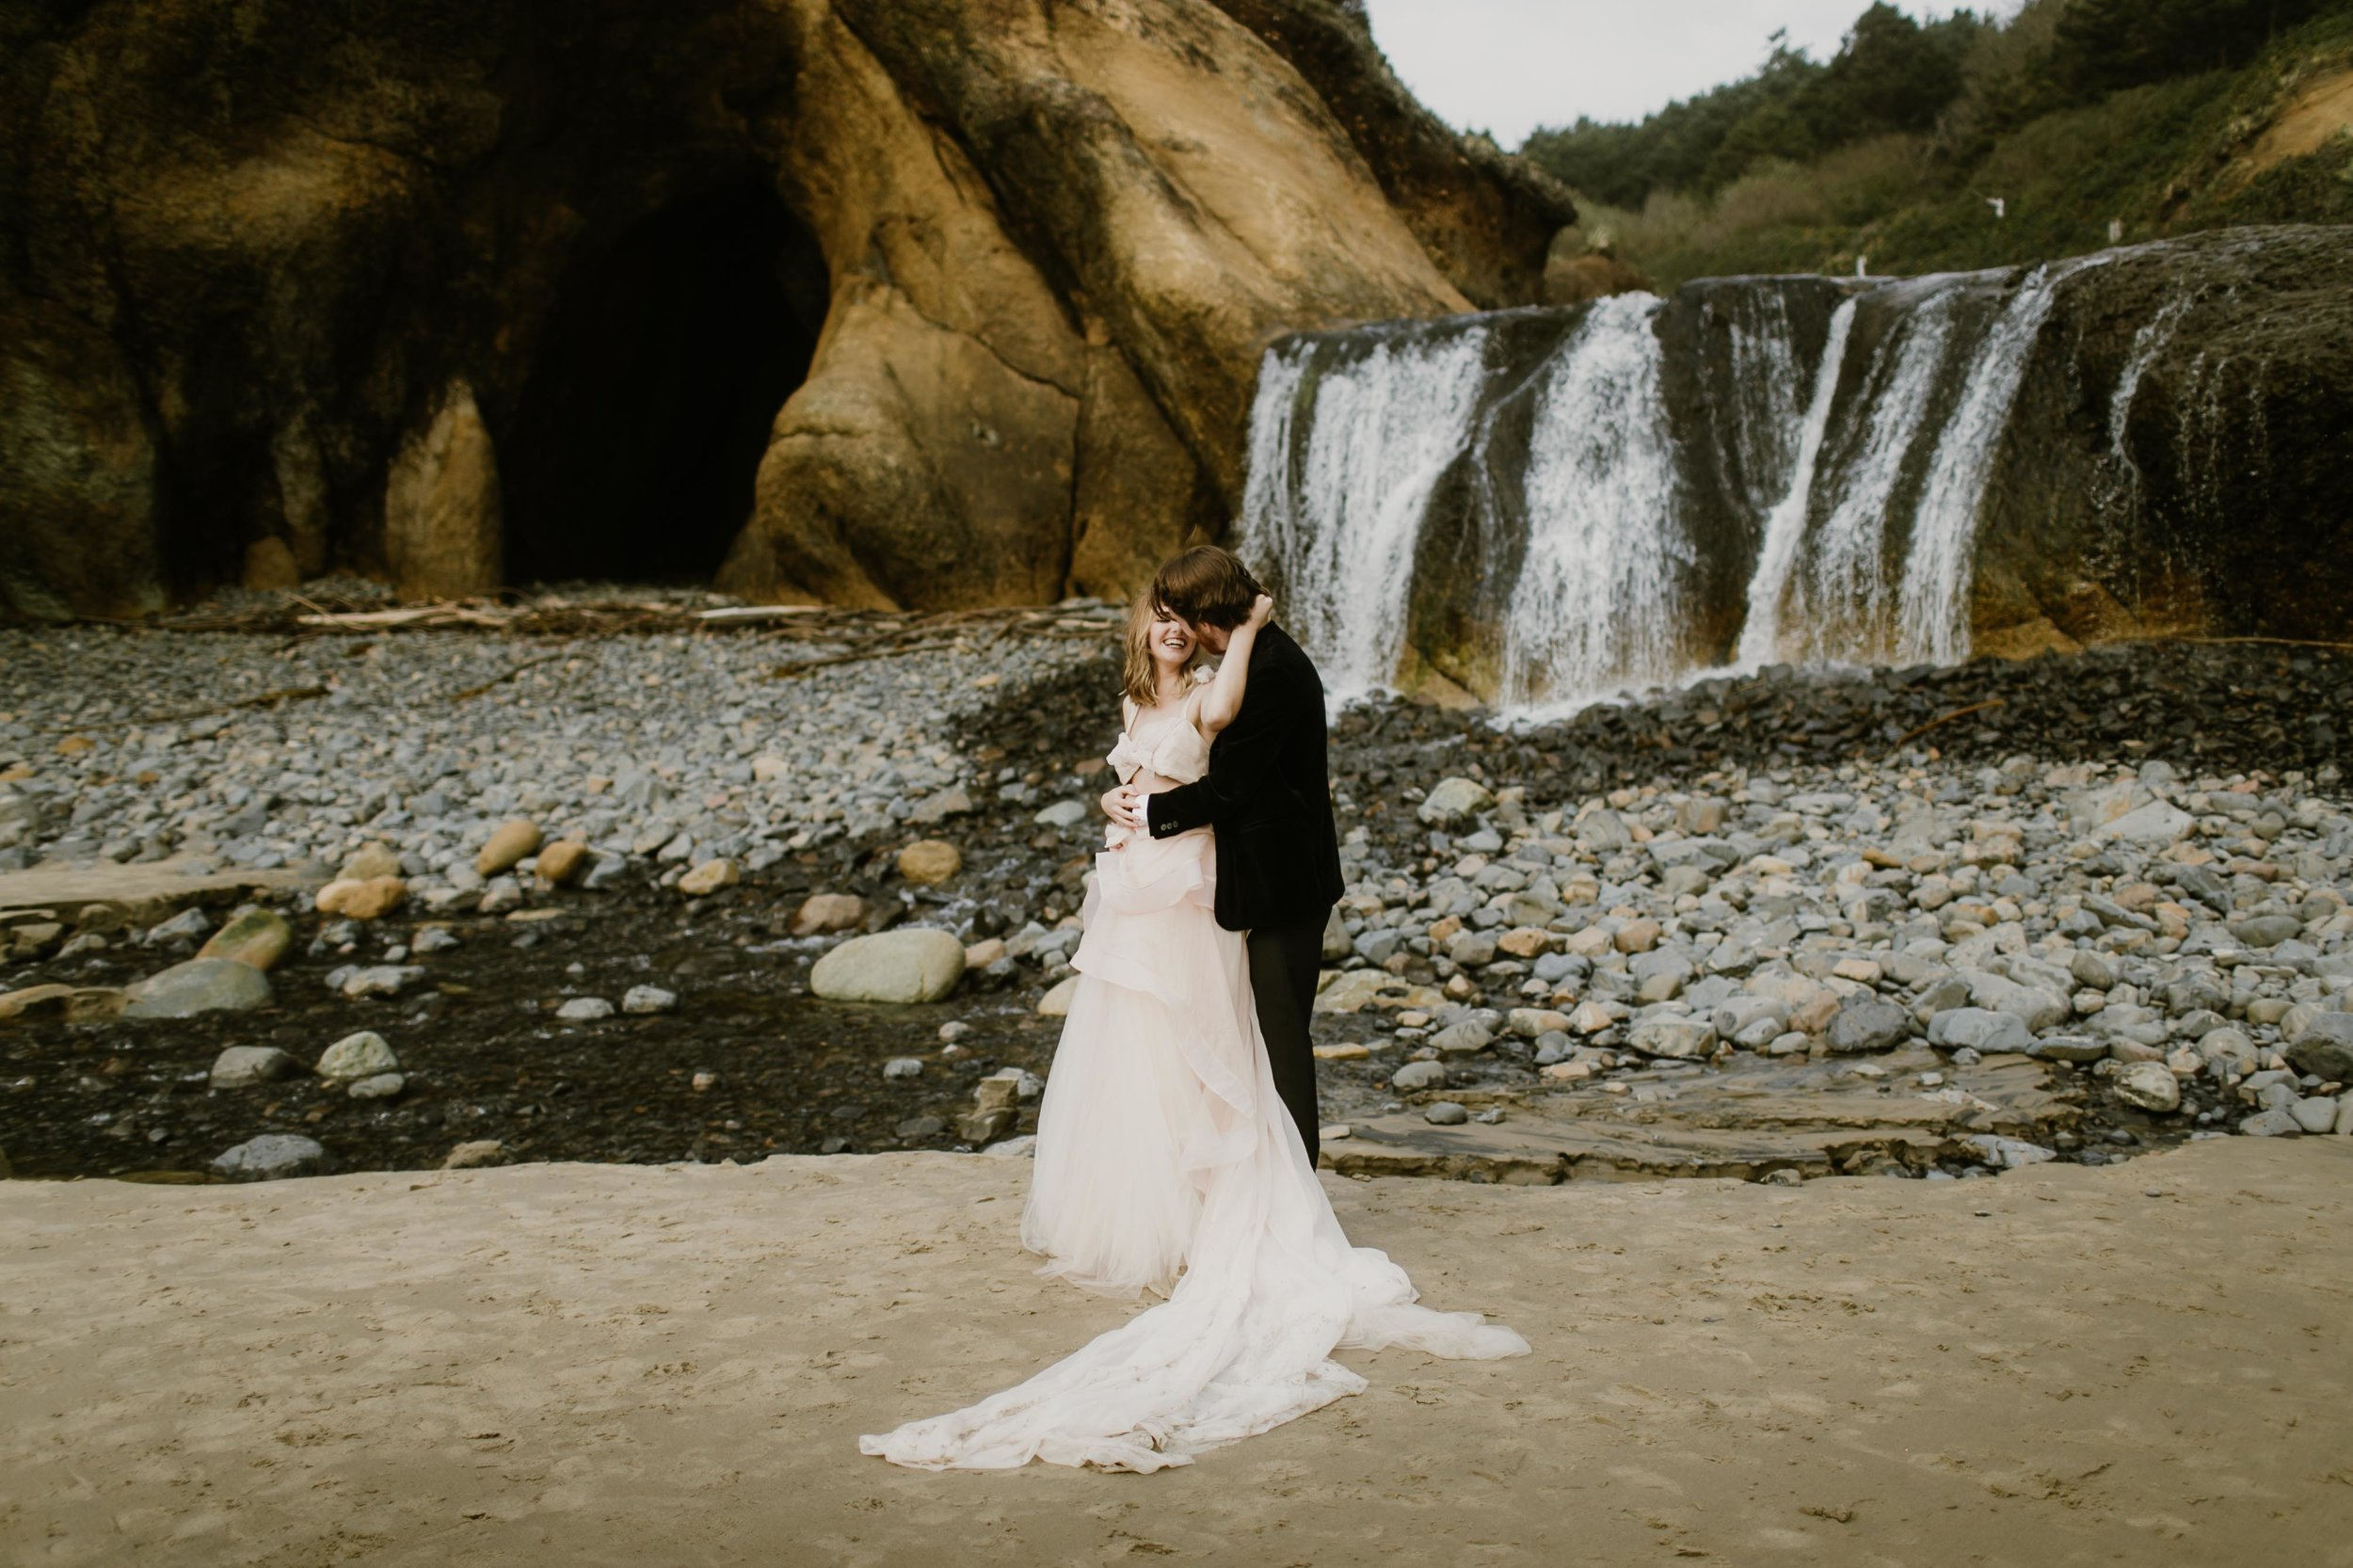 wedding-photo-6.jpg